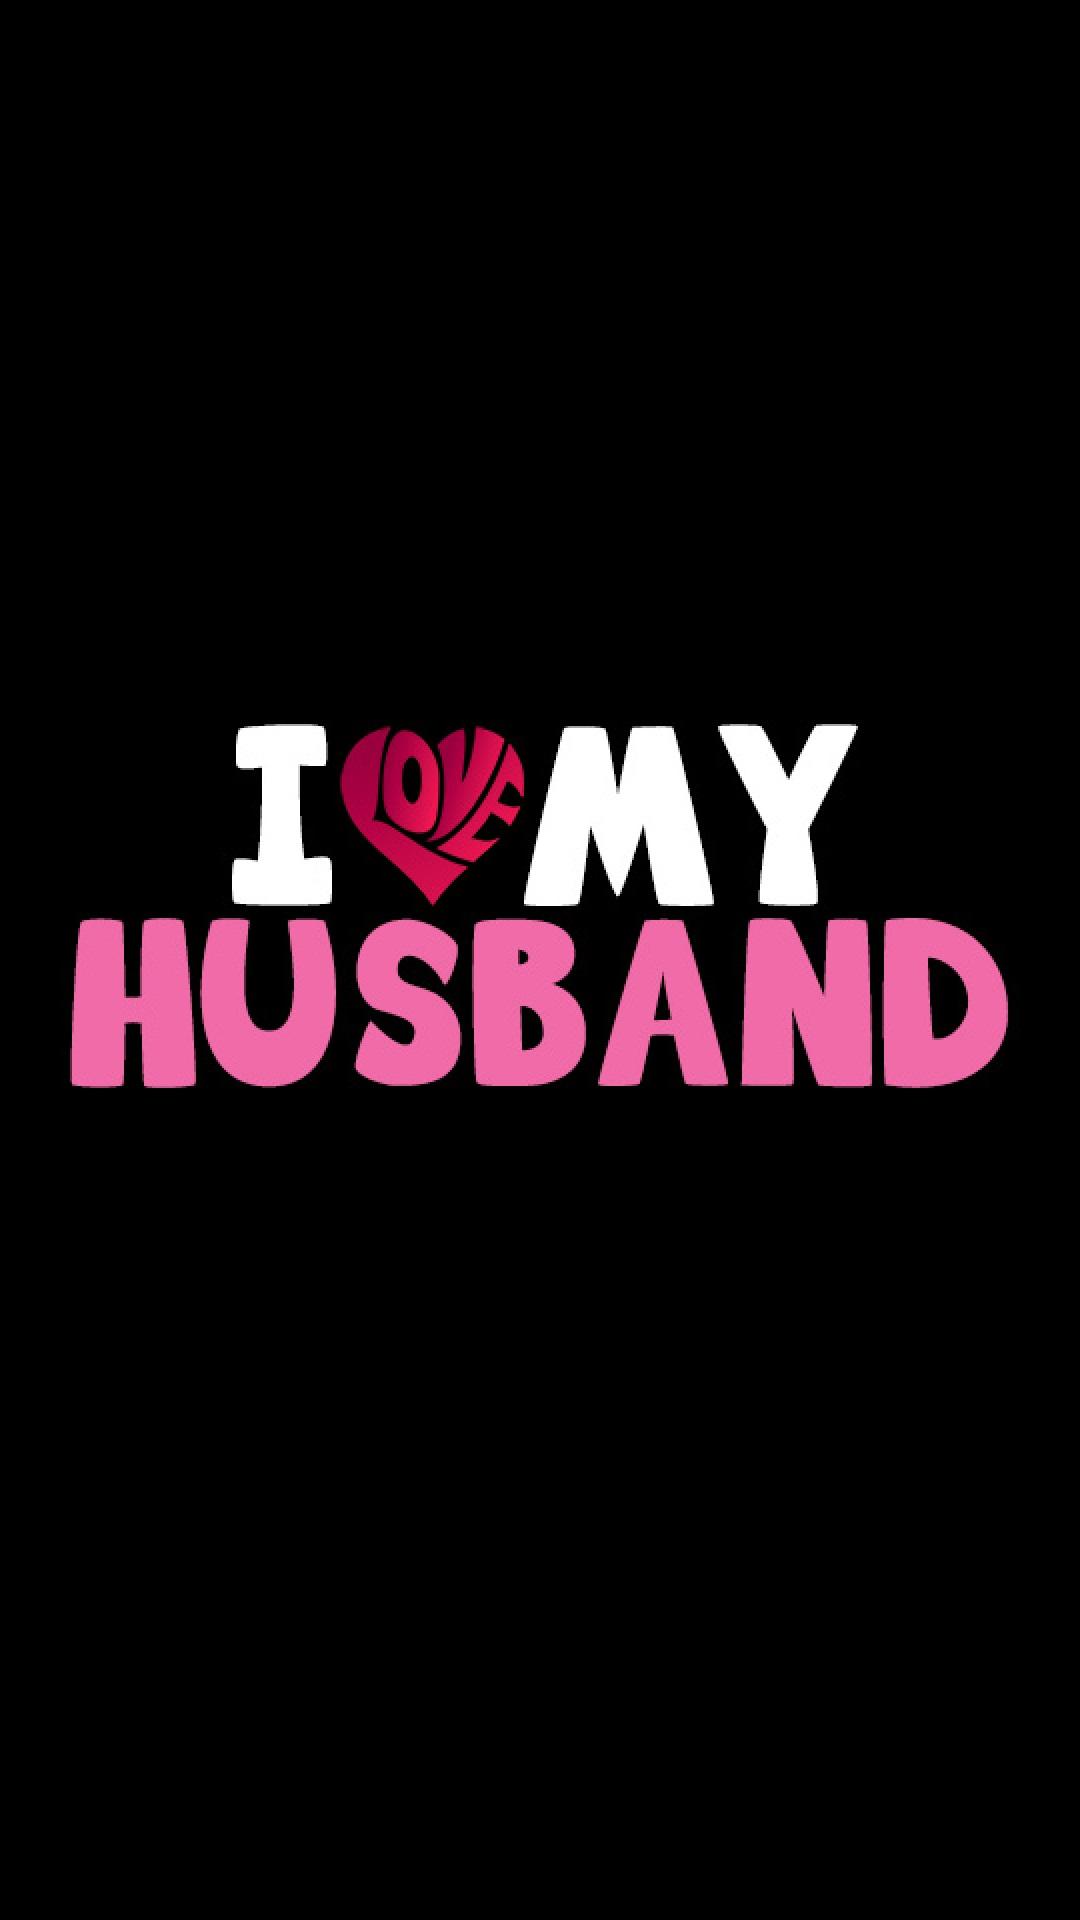 I Love My Husband iPhone 6 Plus Wallpaper 1080x1920 1080x1920